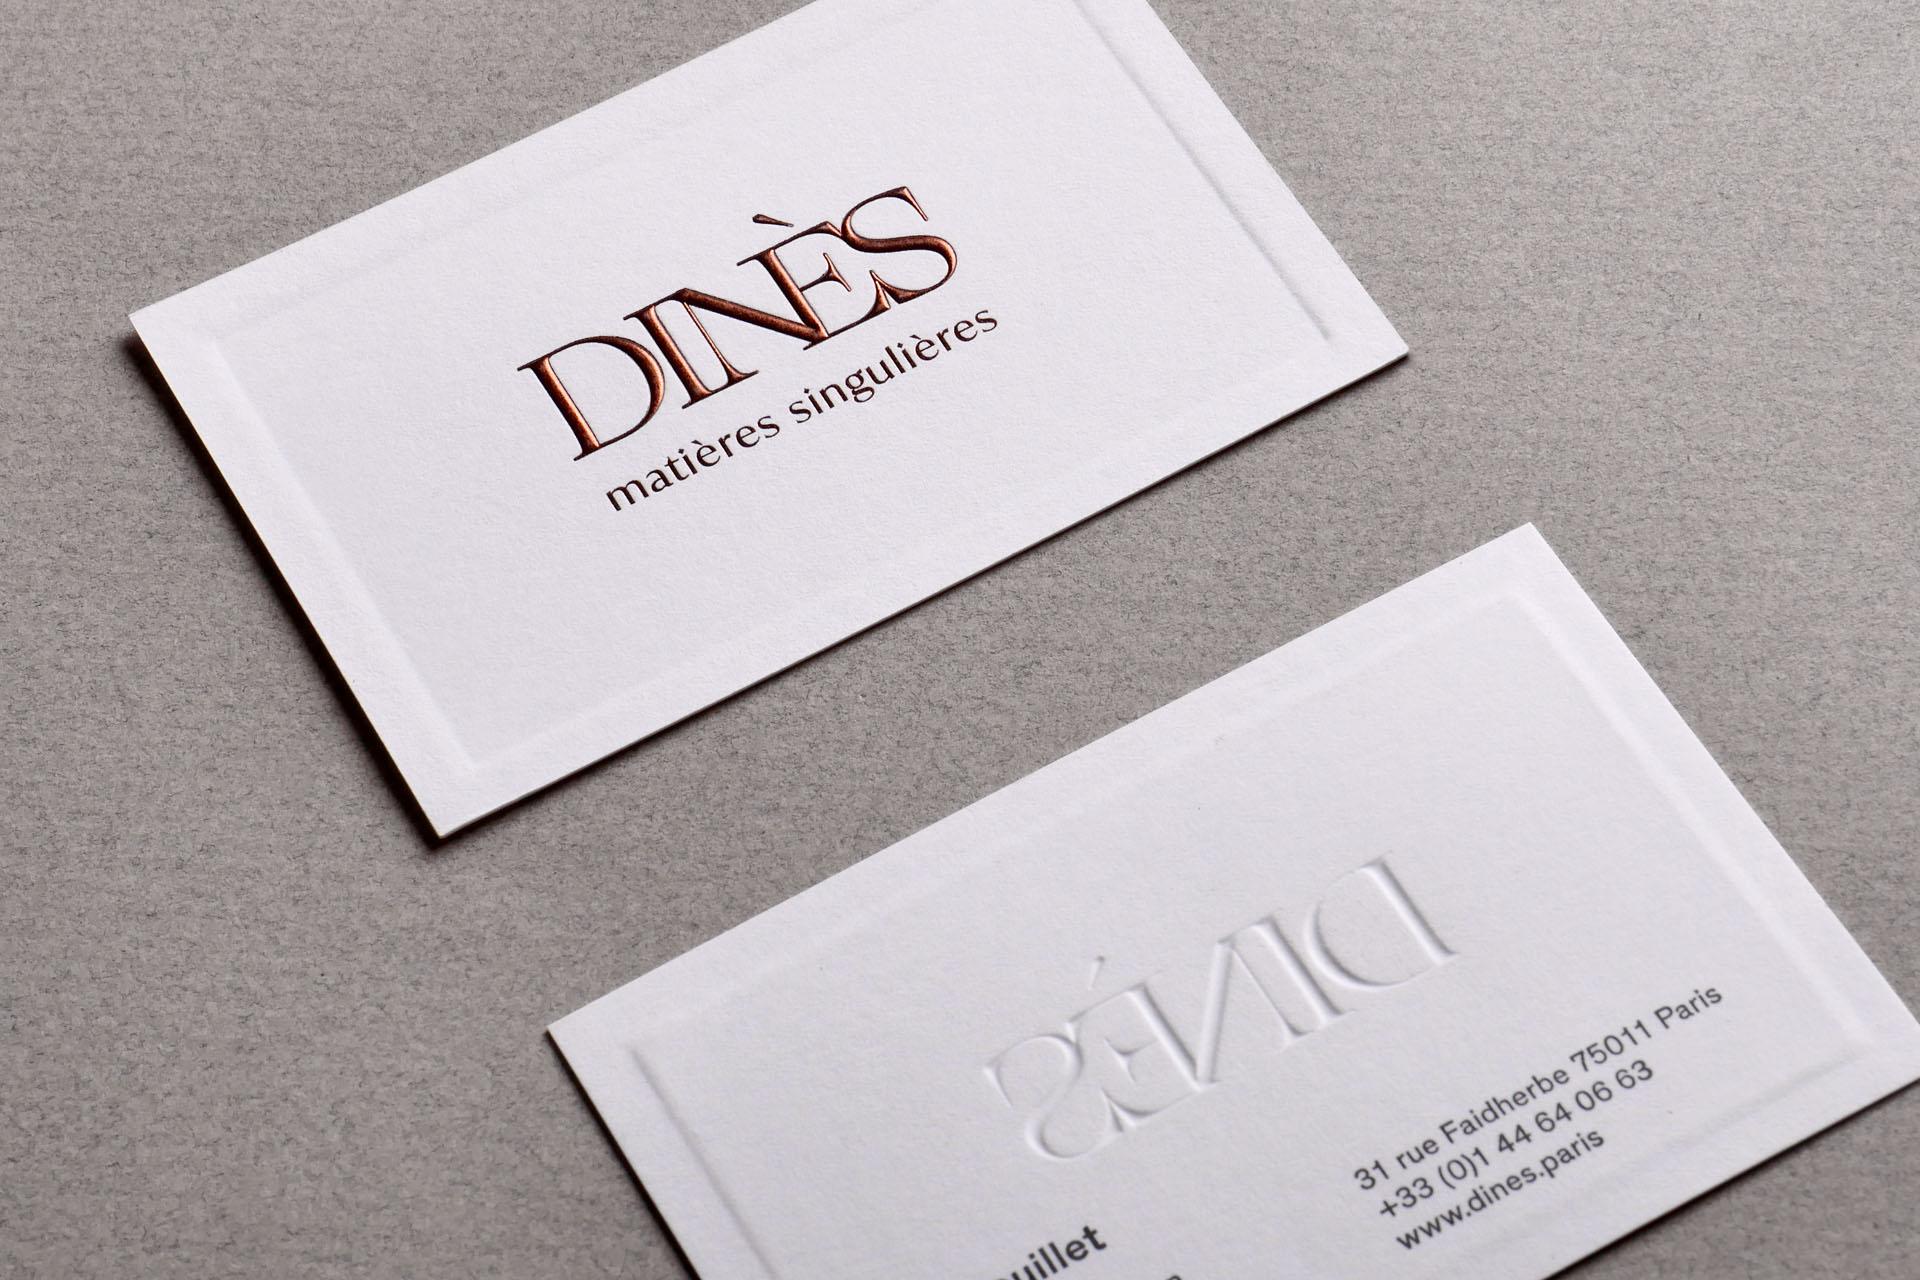 dines-identite-logo-plastac